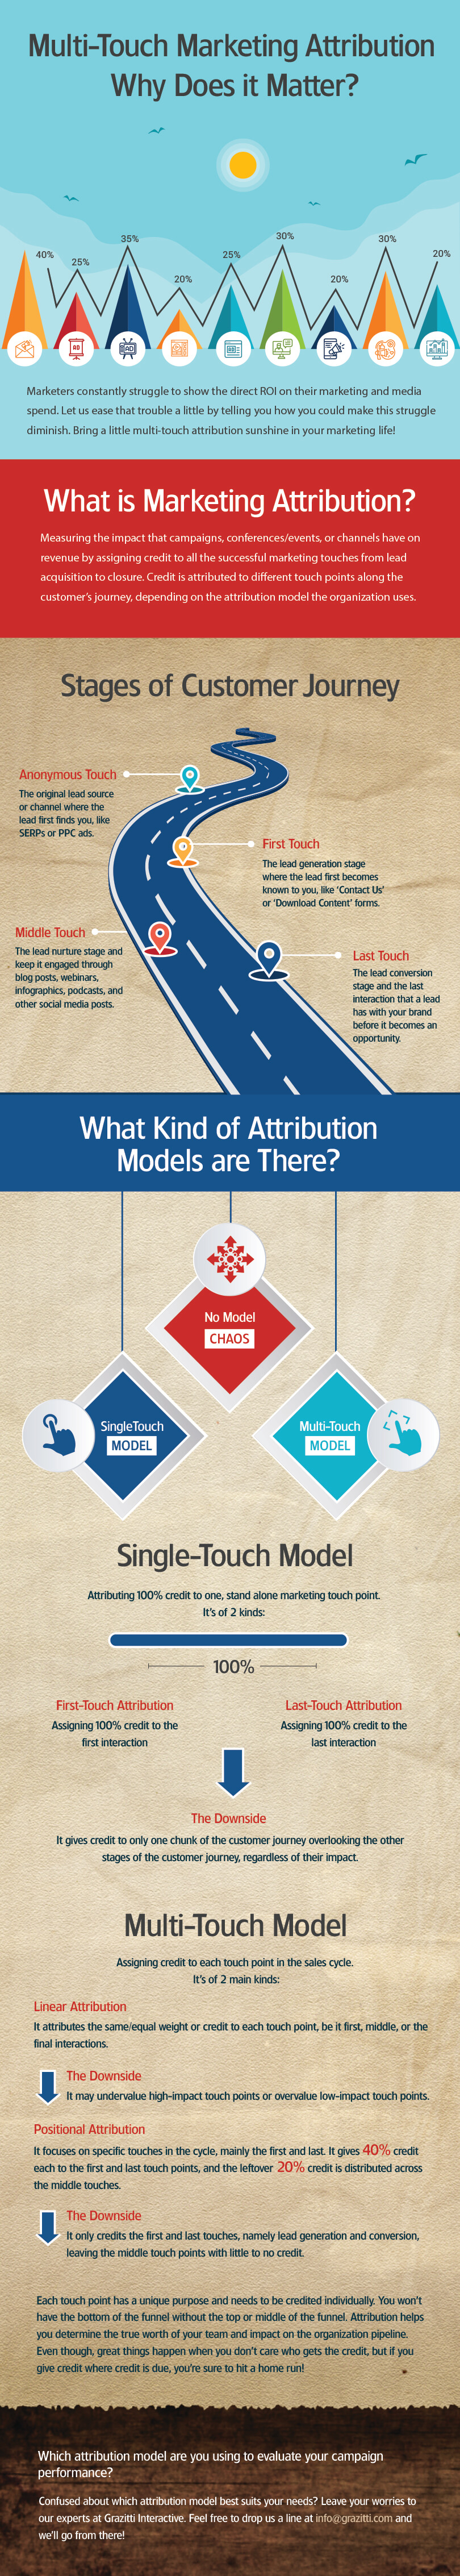 multitouch-marketing-attribution